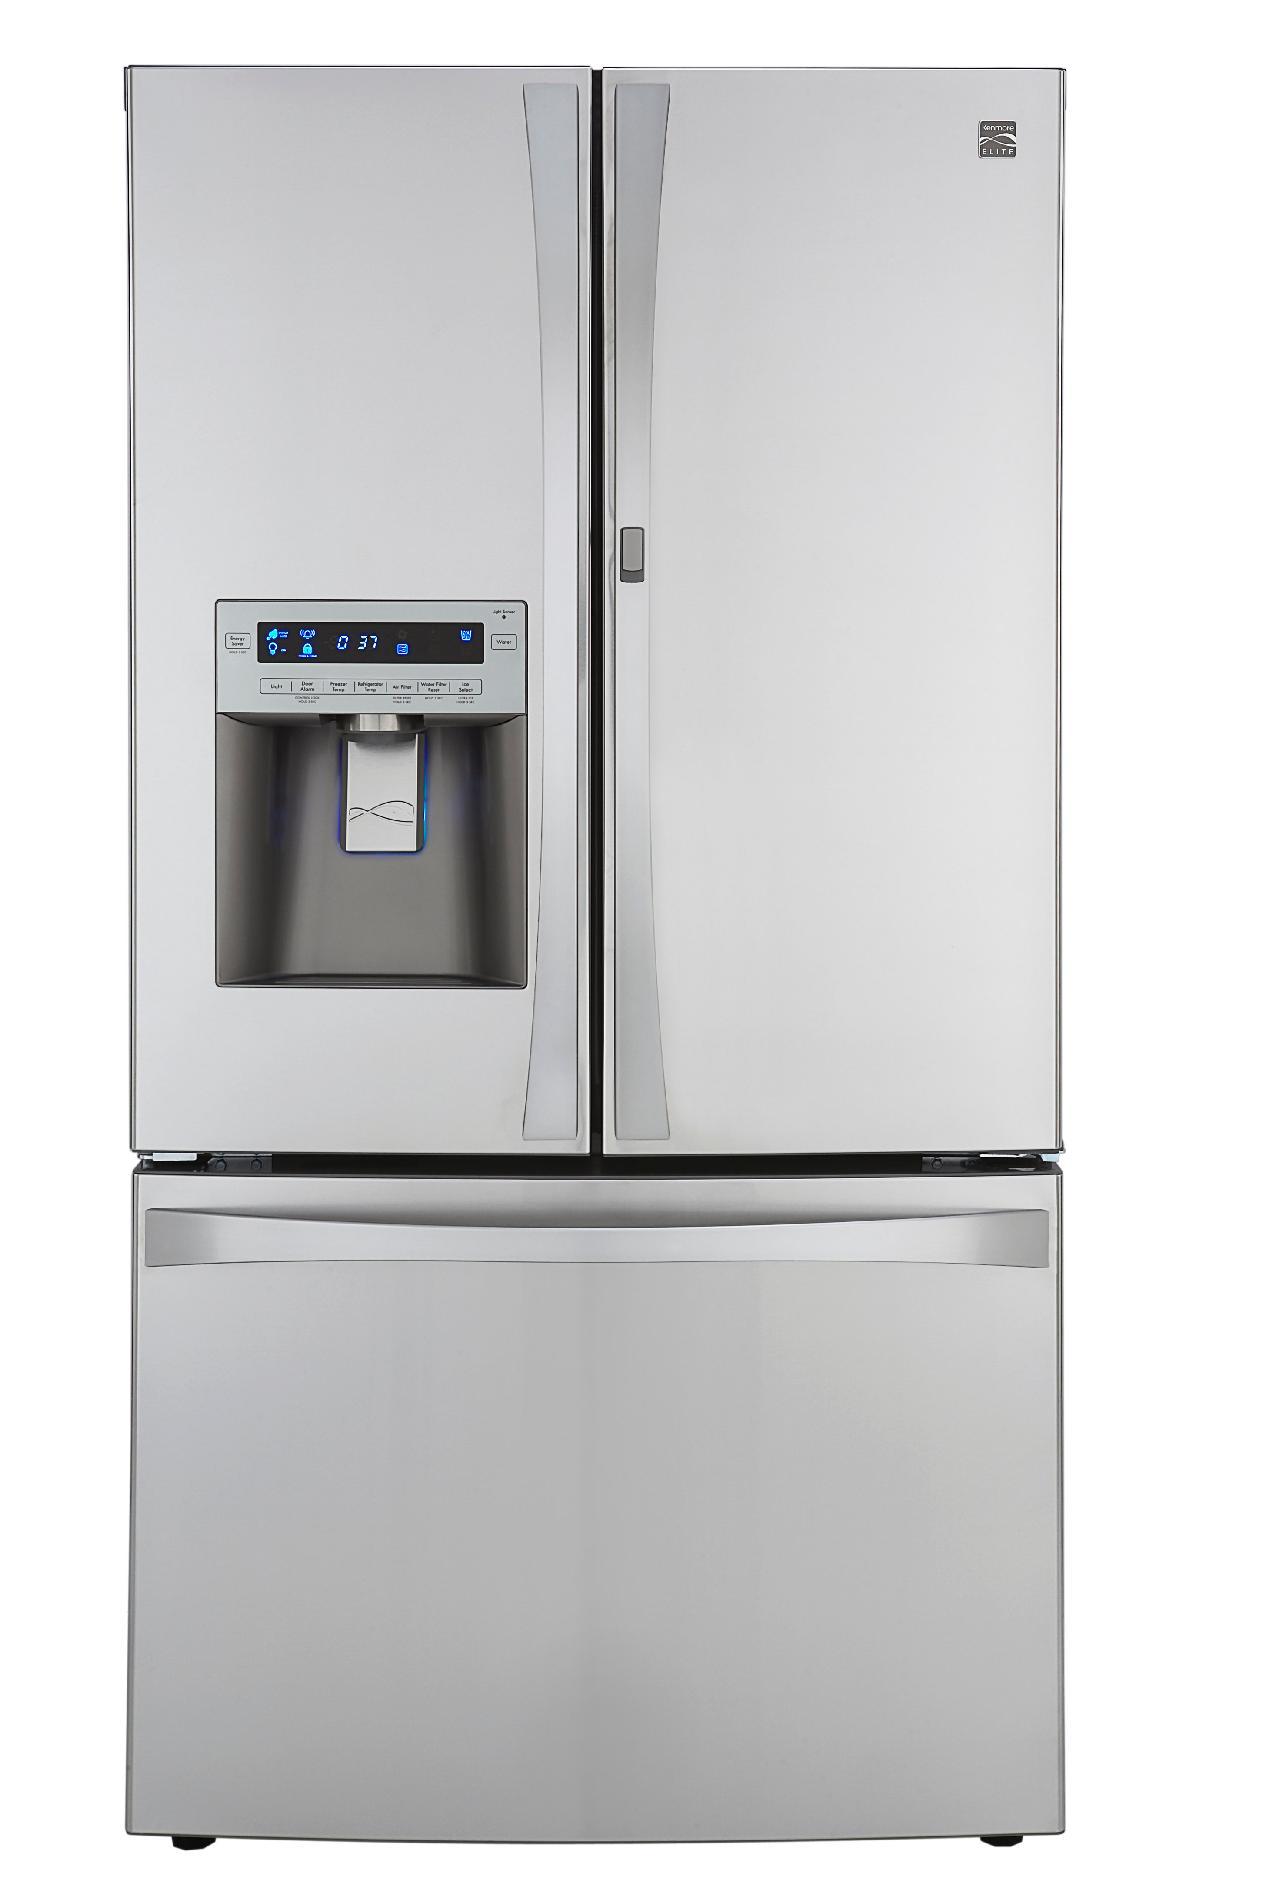 Kenmore Elite 31 cu. ft. Grab-N-Go French Door  Bottom-Freezer Refrigerator - Stainless Steel